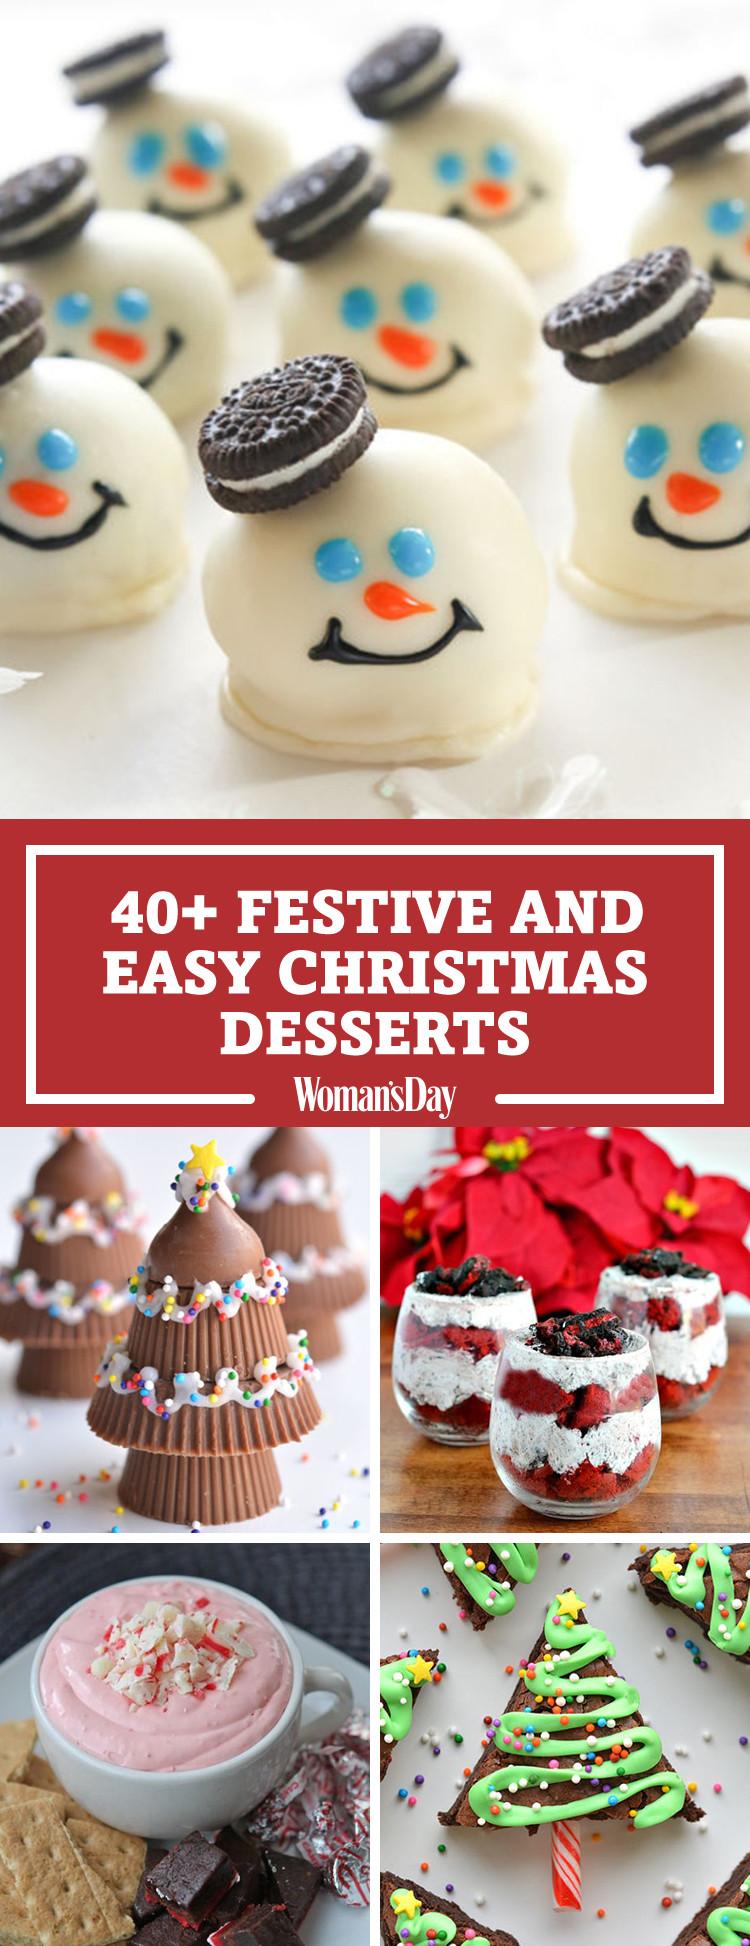 Easy Holiday Dessert Recipes  57 Easy Christmas Dessert Recipes Best Ideas for Fun